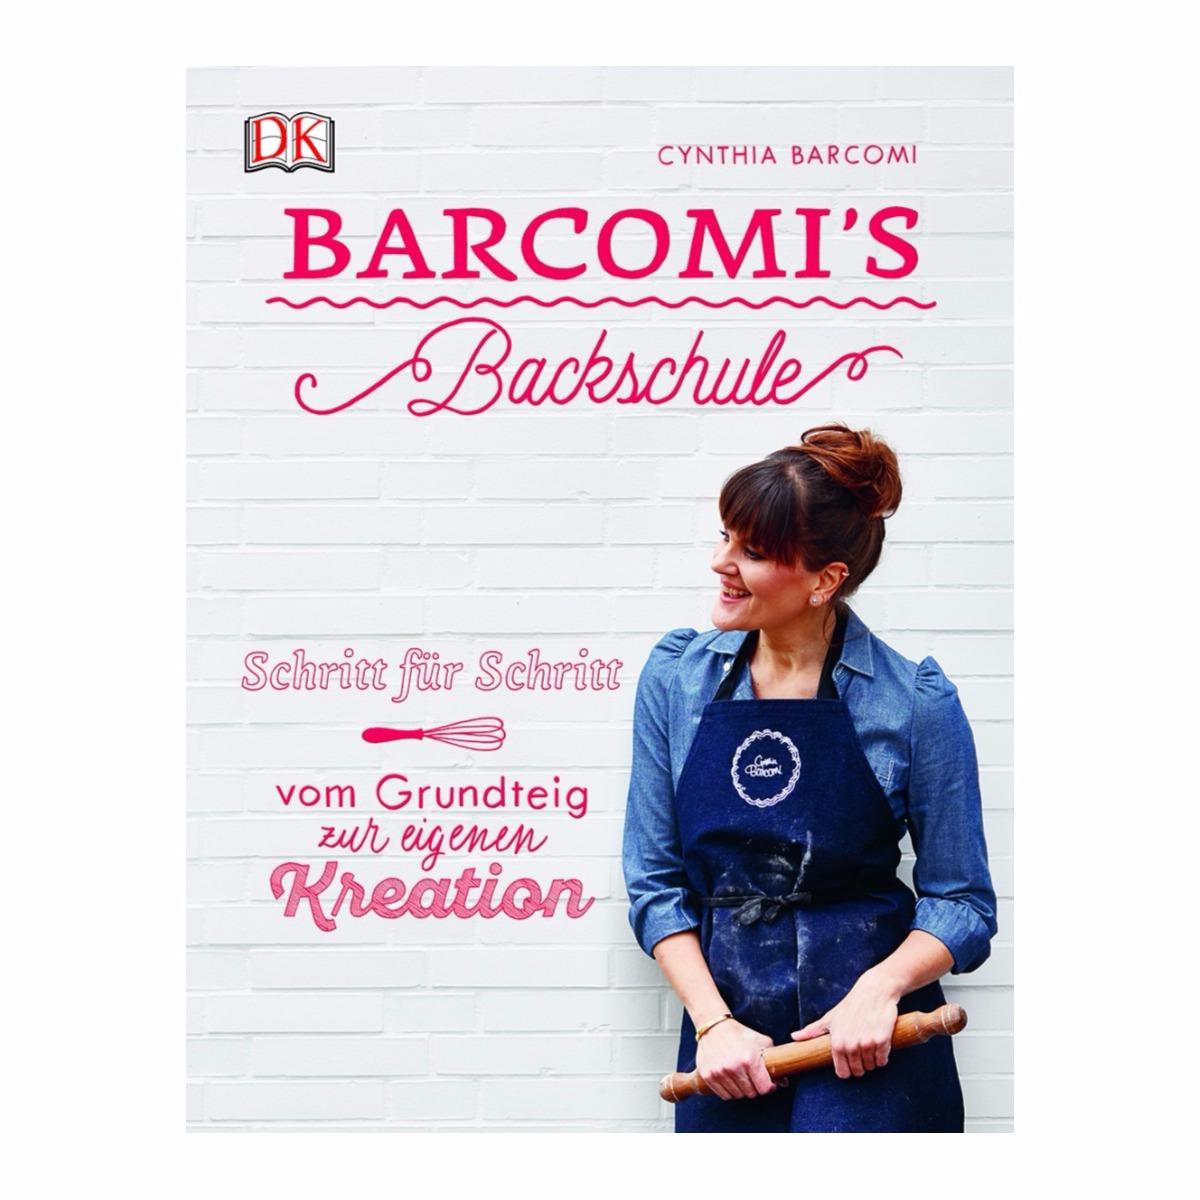 Barcomis Backstube Kochbuch 2017